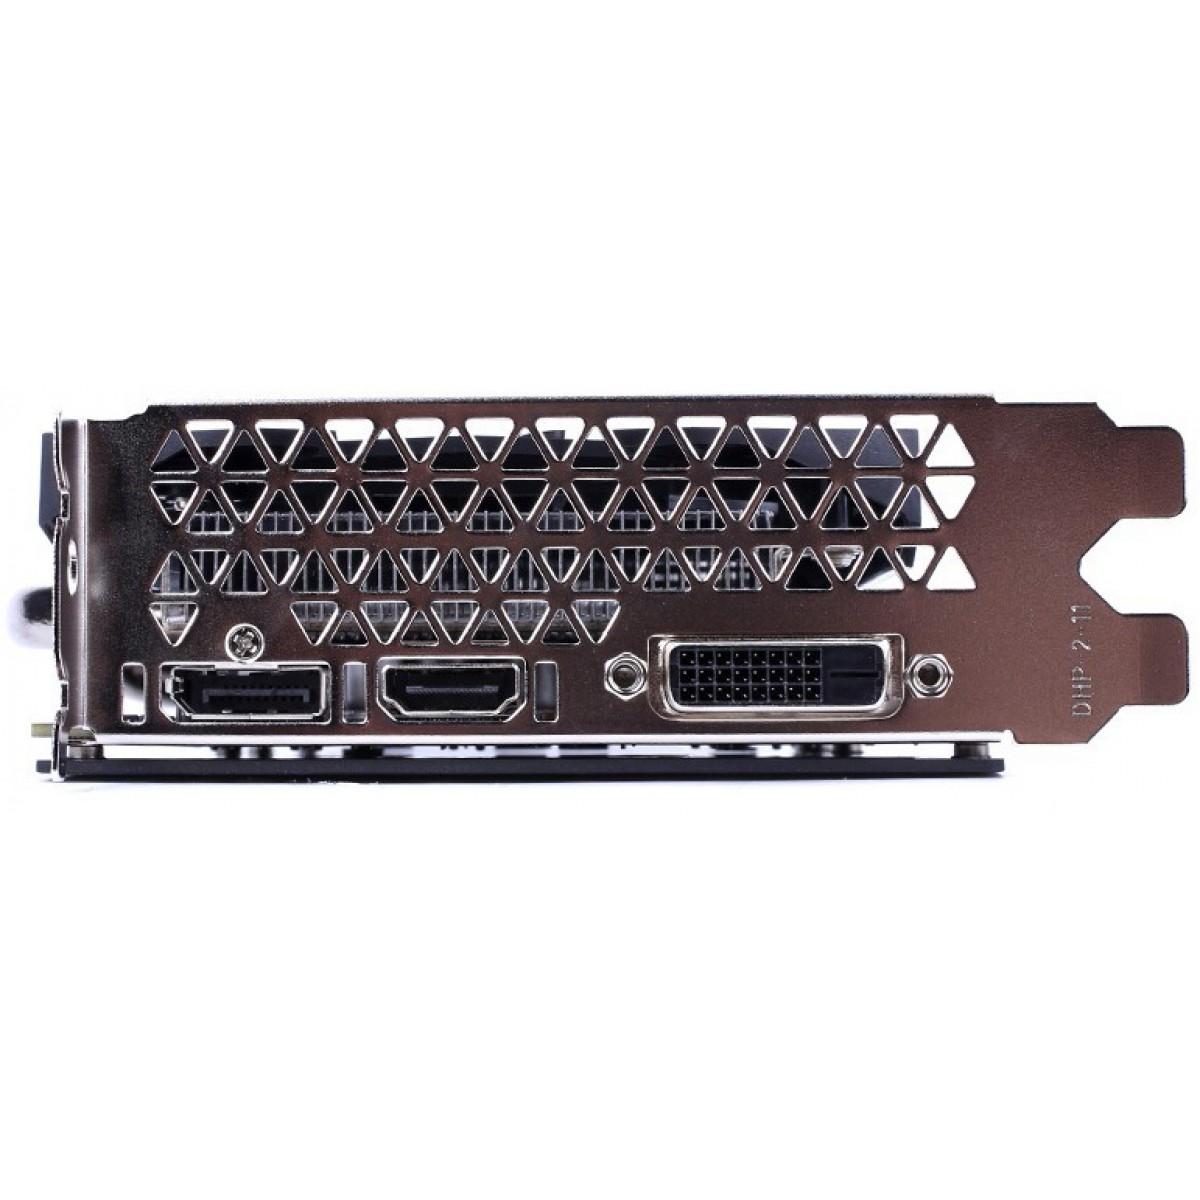 Placa de Vídeo Colorful GeForce GTX 1660 Ti 6G-V Dual, 6GB GDDR6, 192Bit